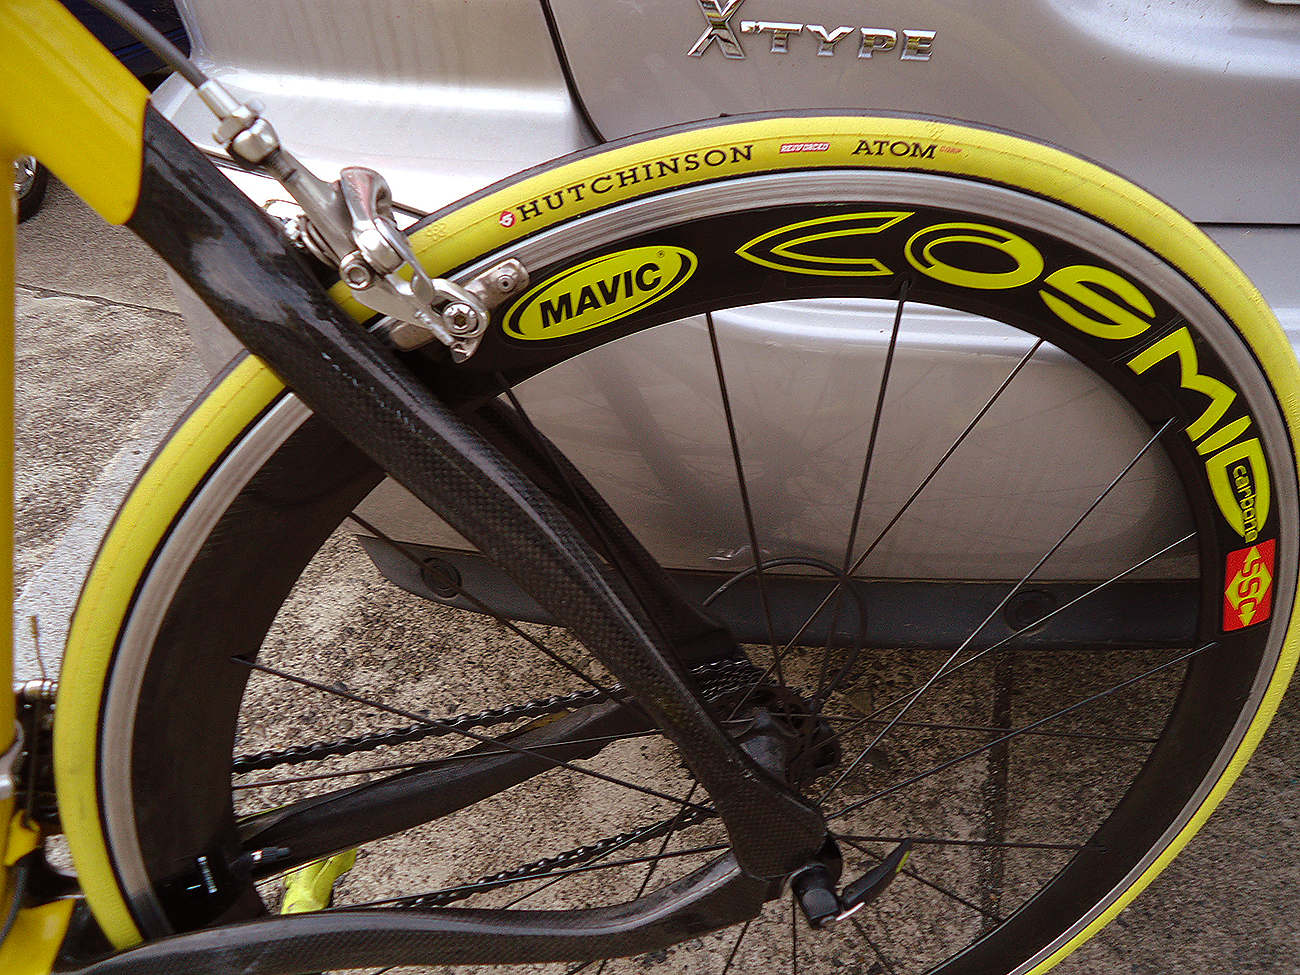 http://moritetsu.info/bicycle/img/DSC07286ss.jpg